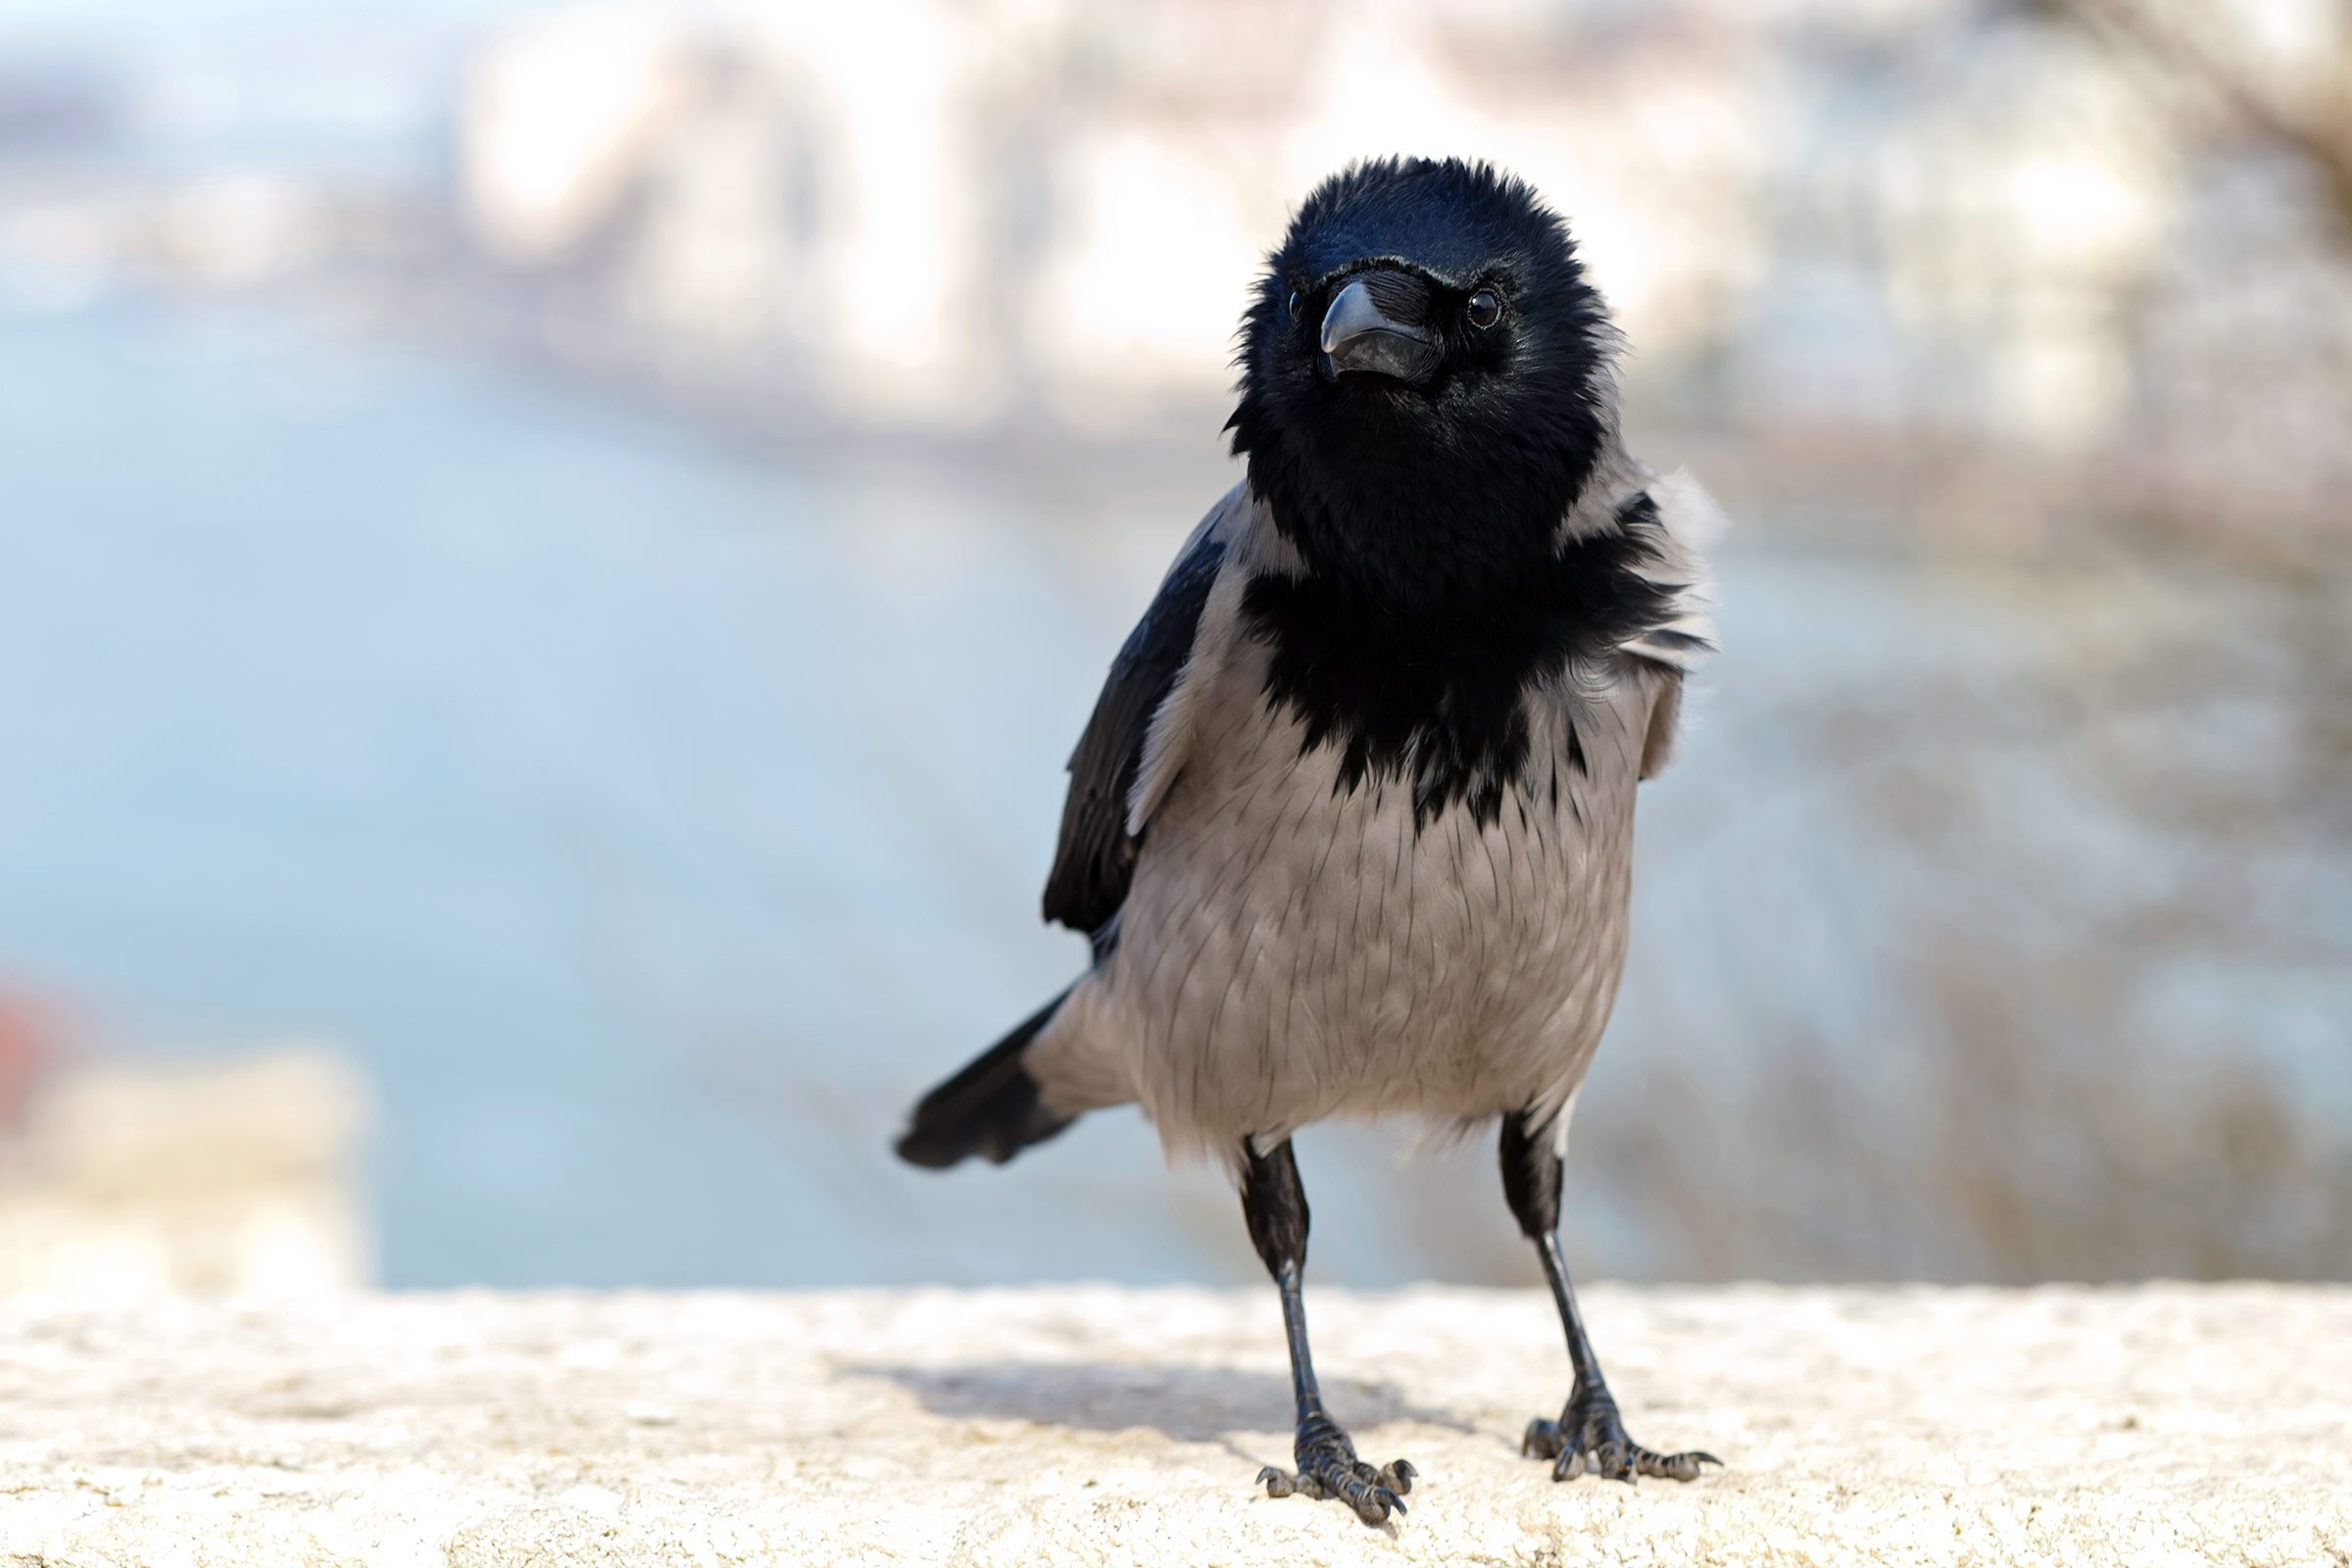 smart animals crow